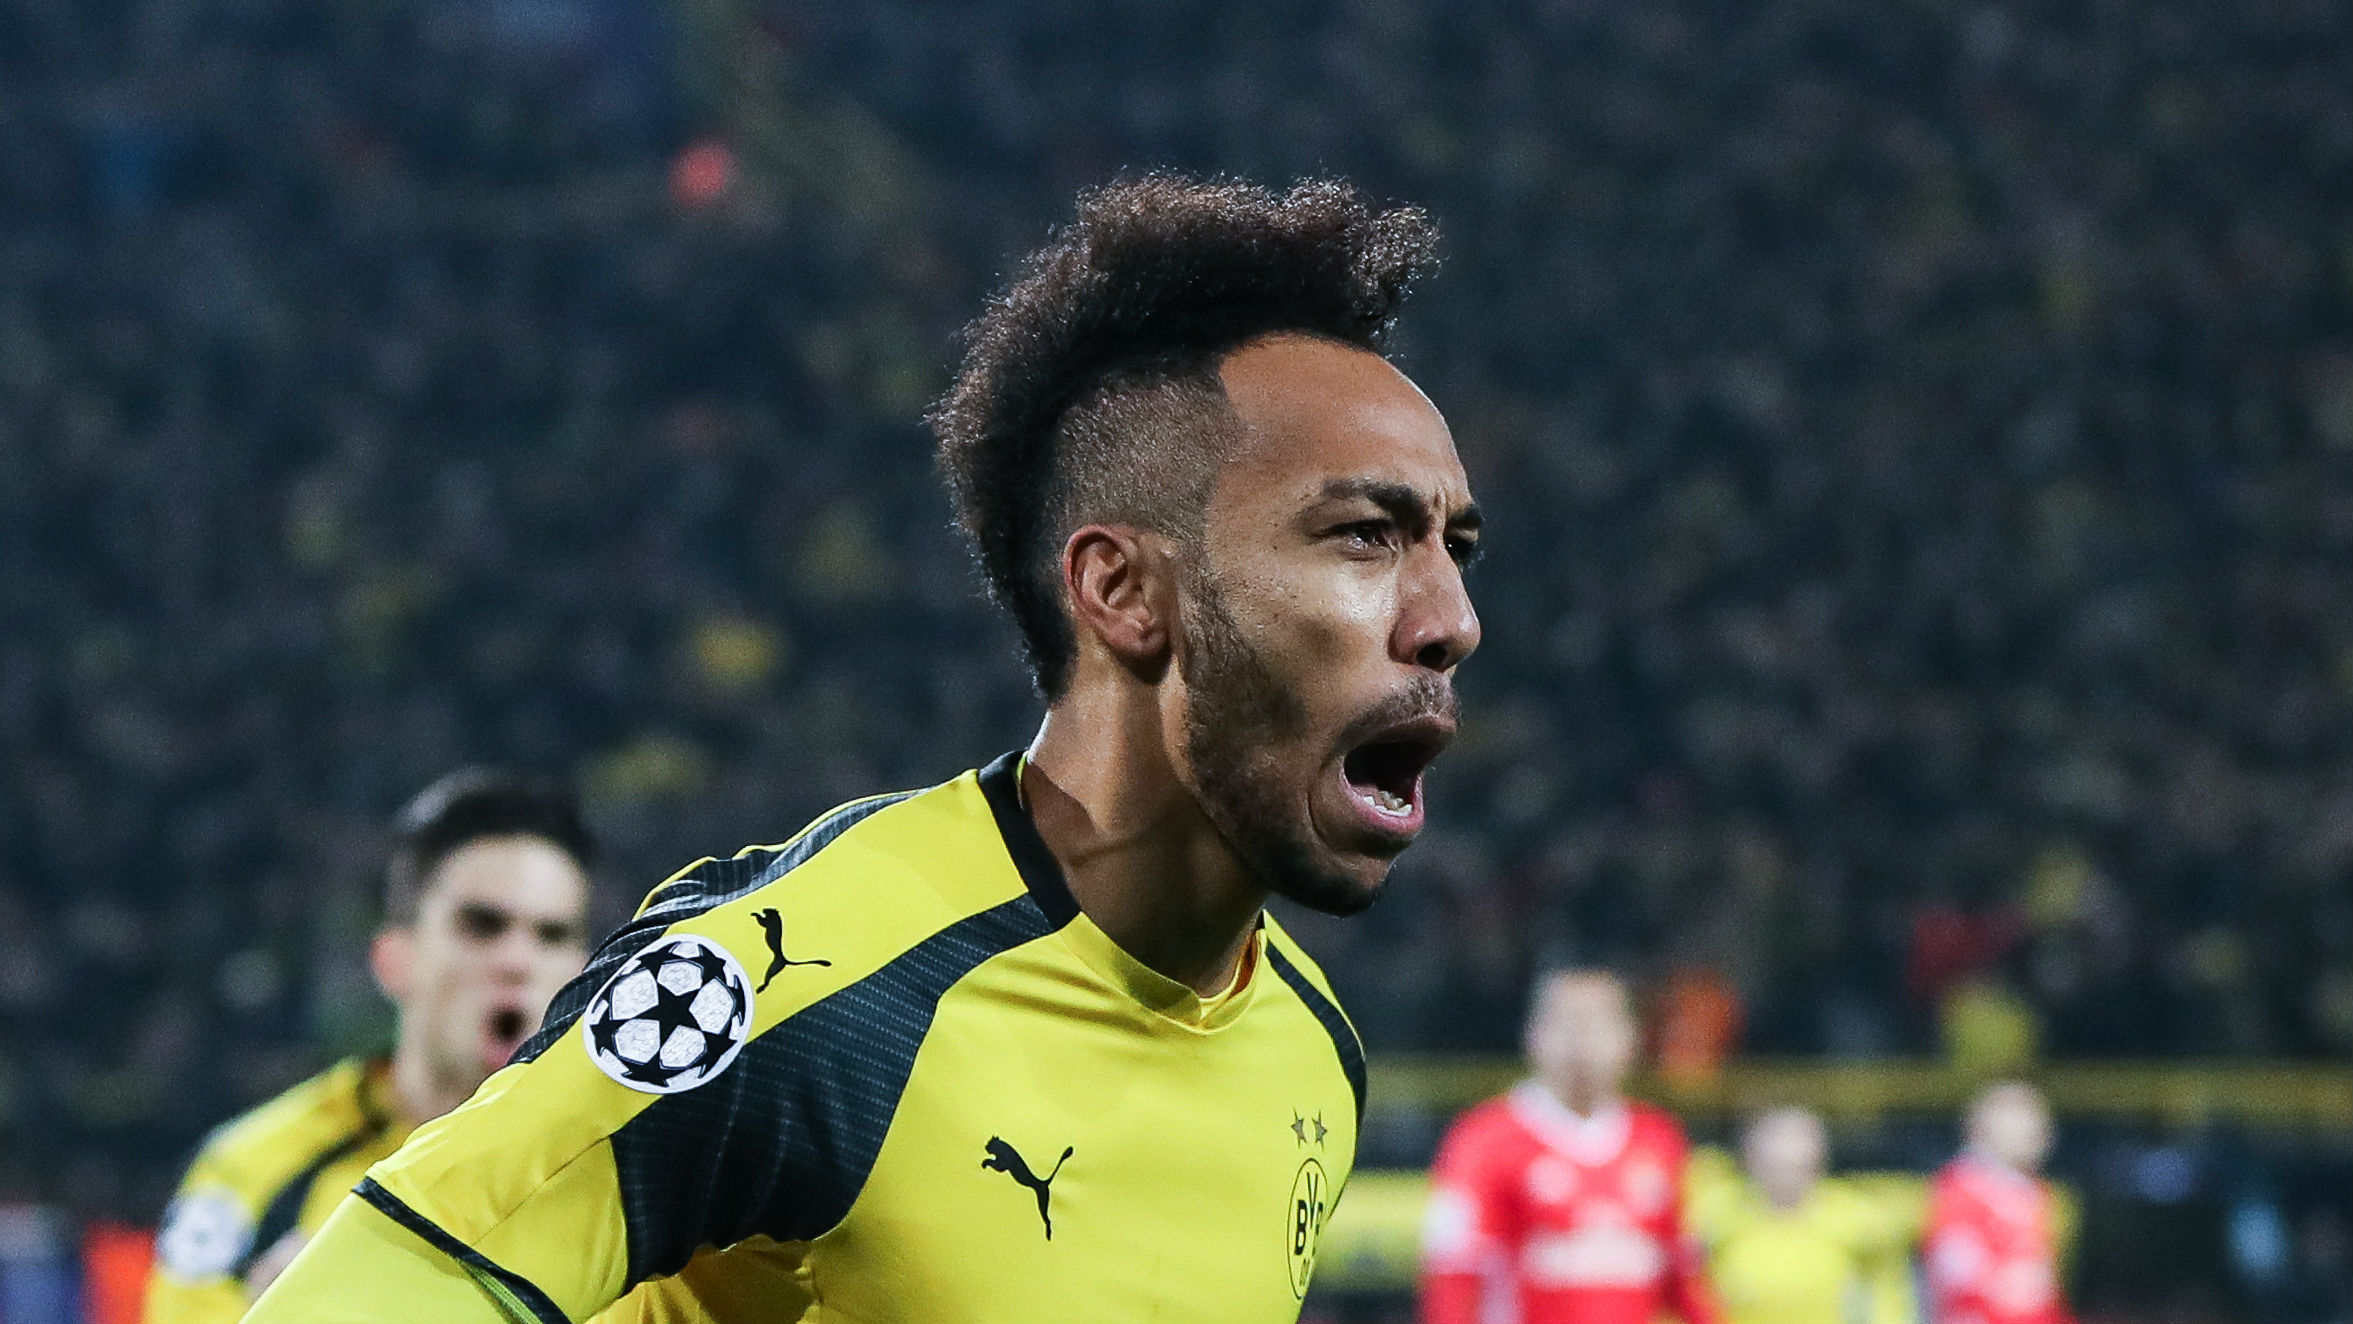 pierre emerick aubameyang dortmund 6qtvxj24xsru19tf0vj8tch2r - Borussia Dortmund 4-0  Benfica: Aubameyang, Pulisic See Dortmund to Quarter Finals